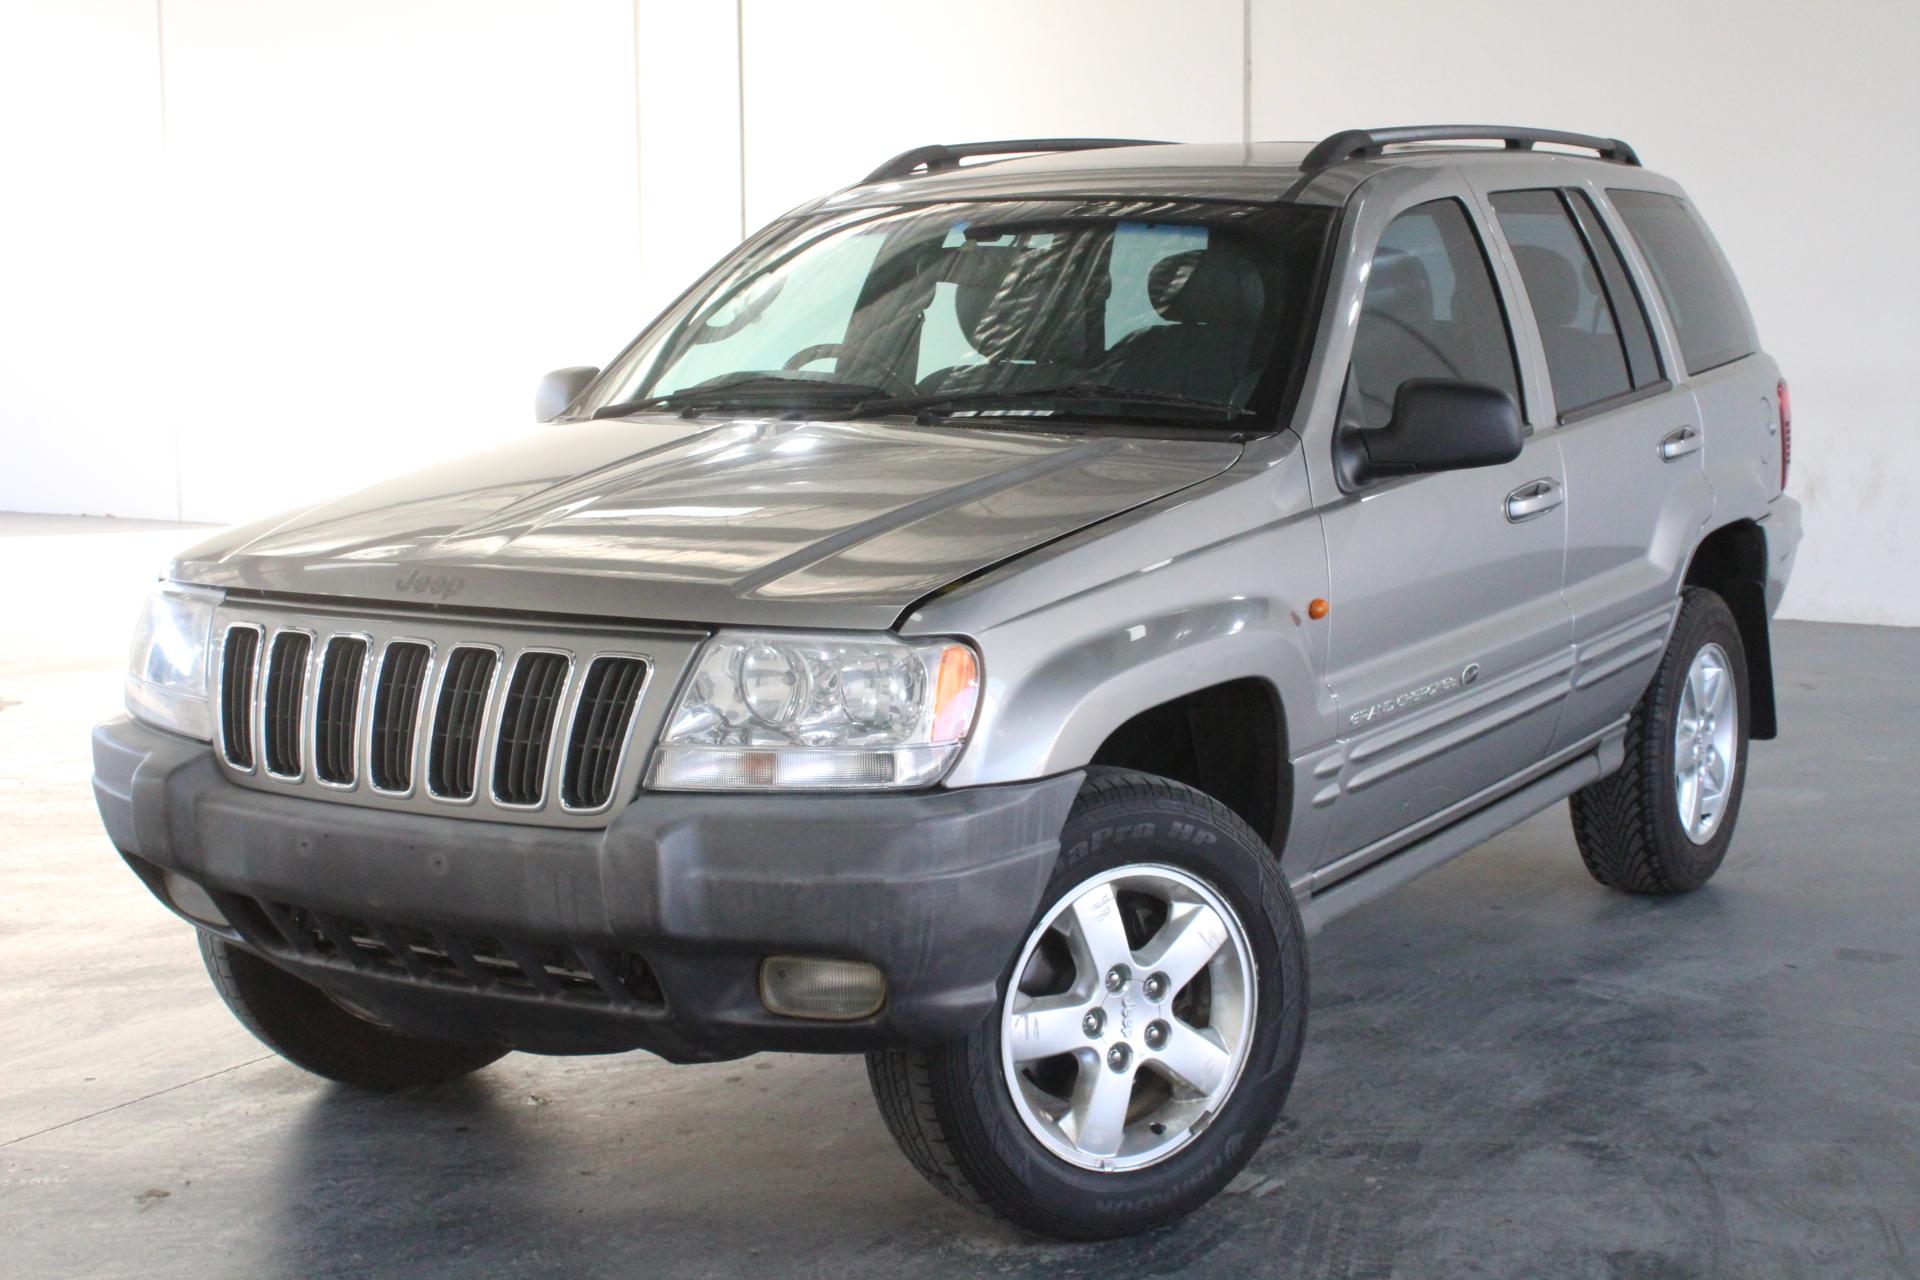 2002 Jeep Grand Cherokee Overland (4x4) WG Automatic Wagon